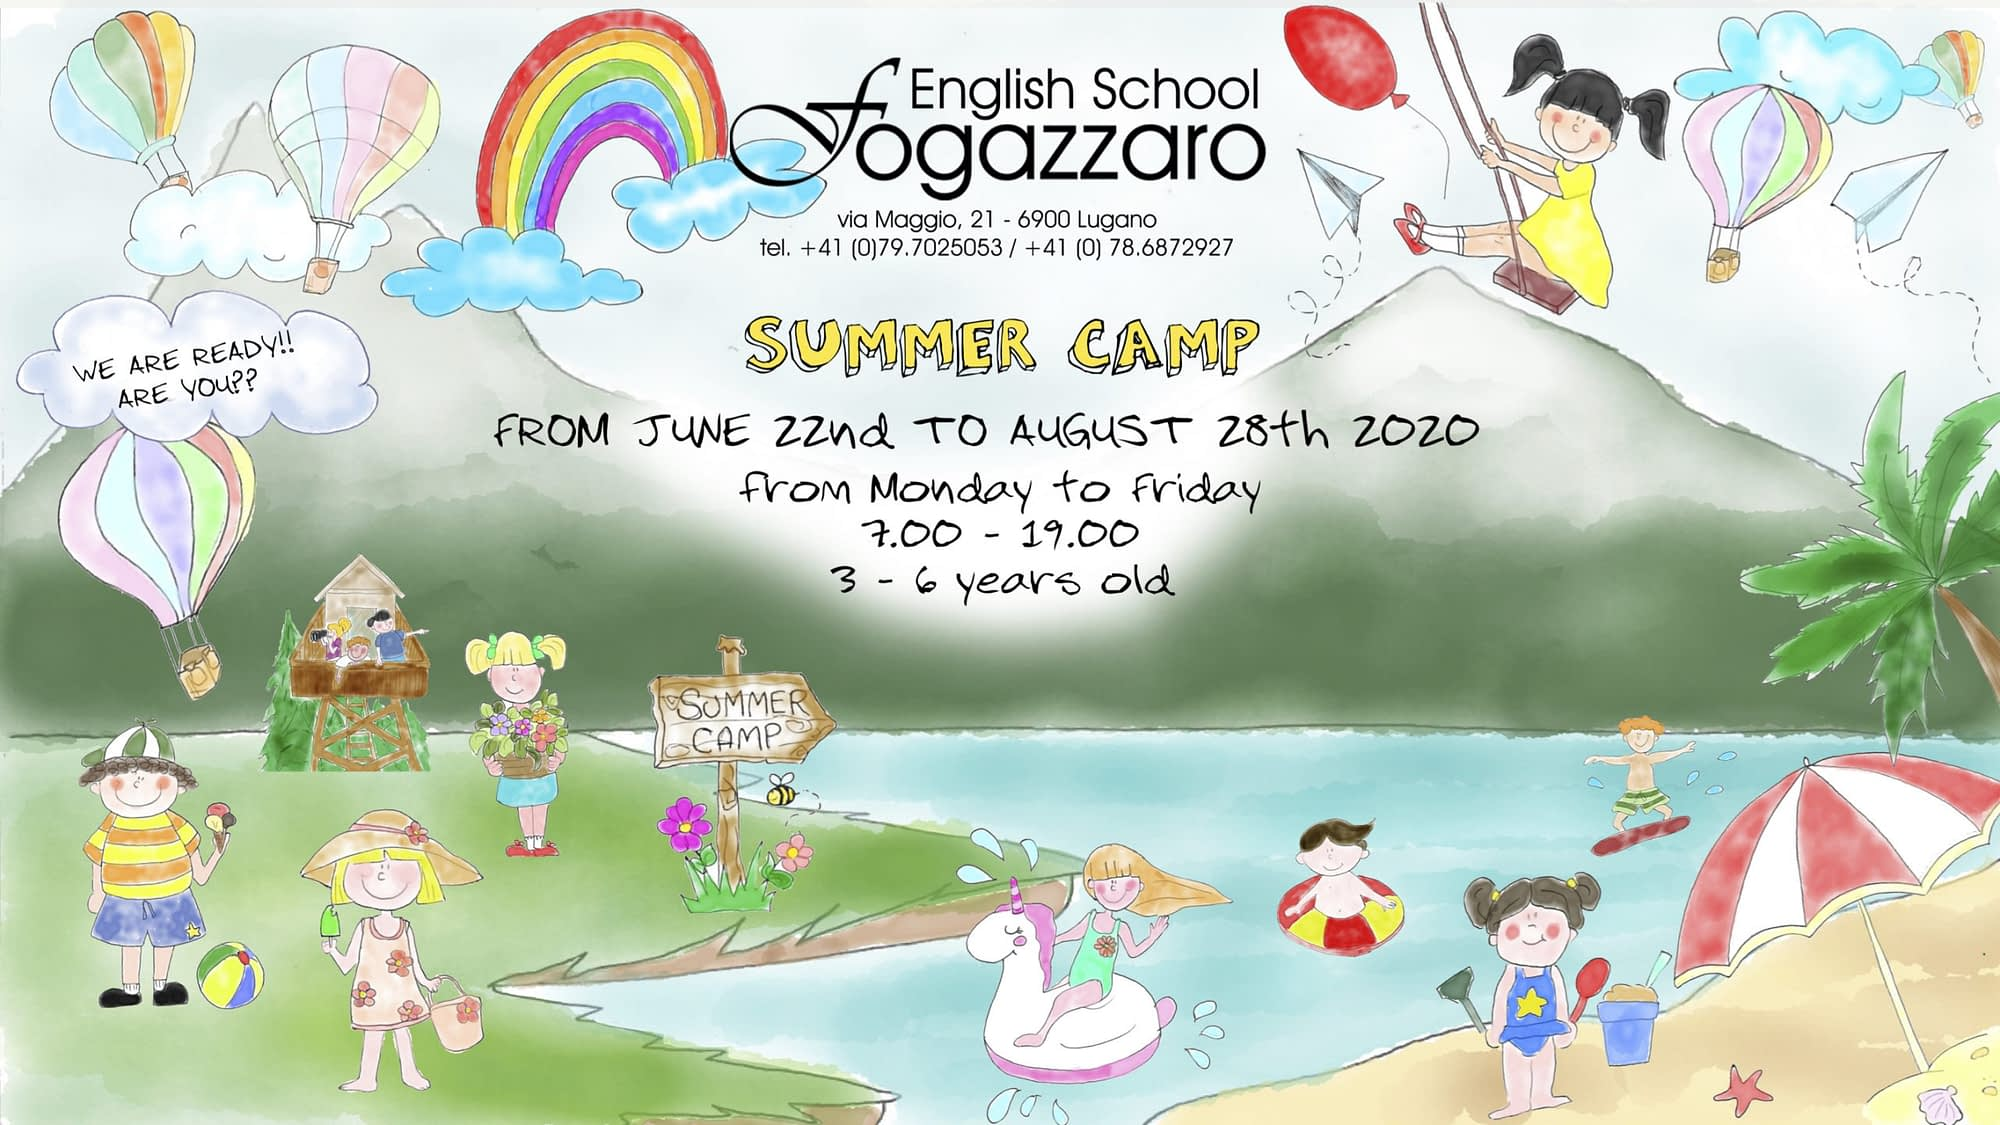 Fogazzaro English School Summer Camp